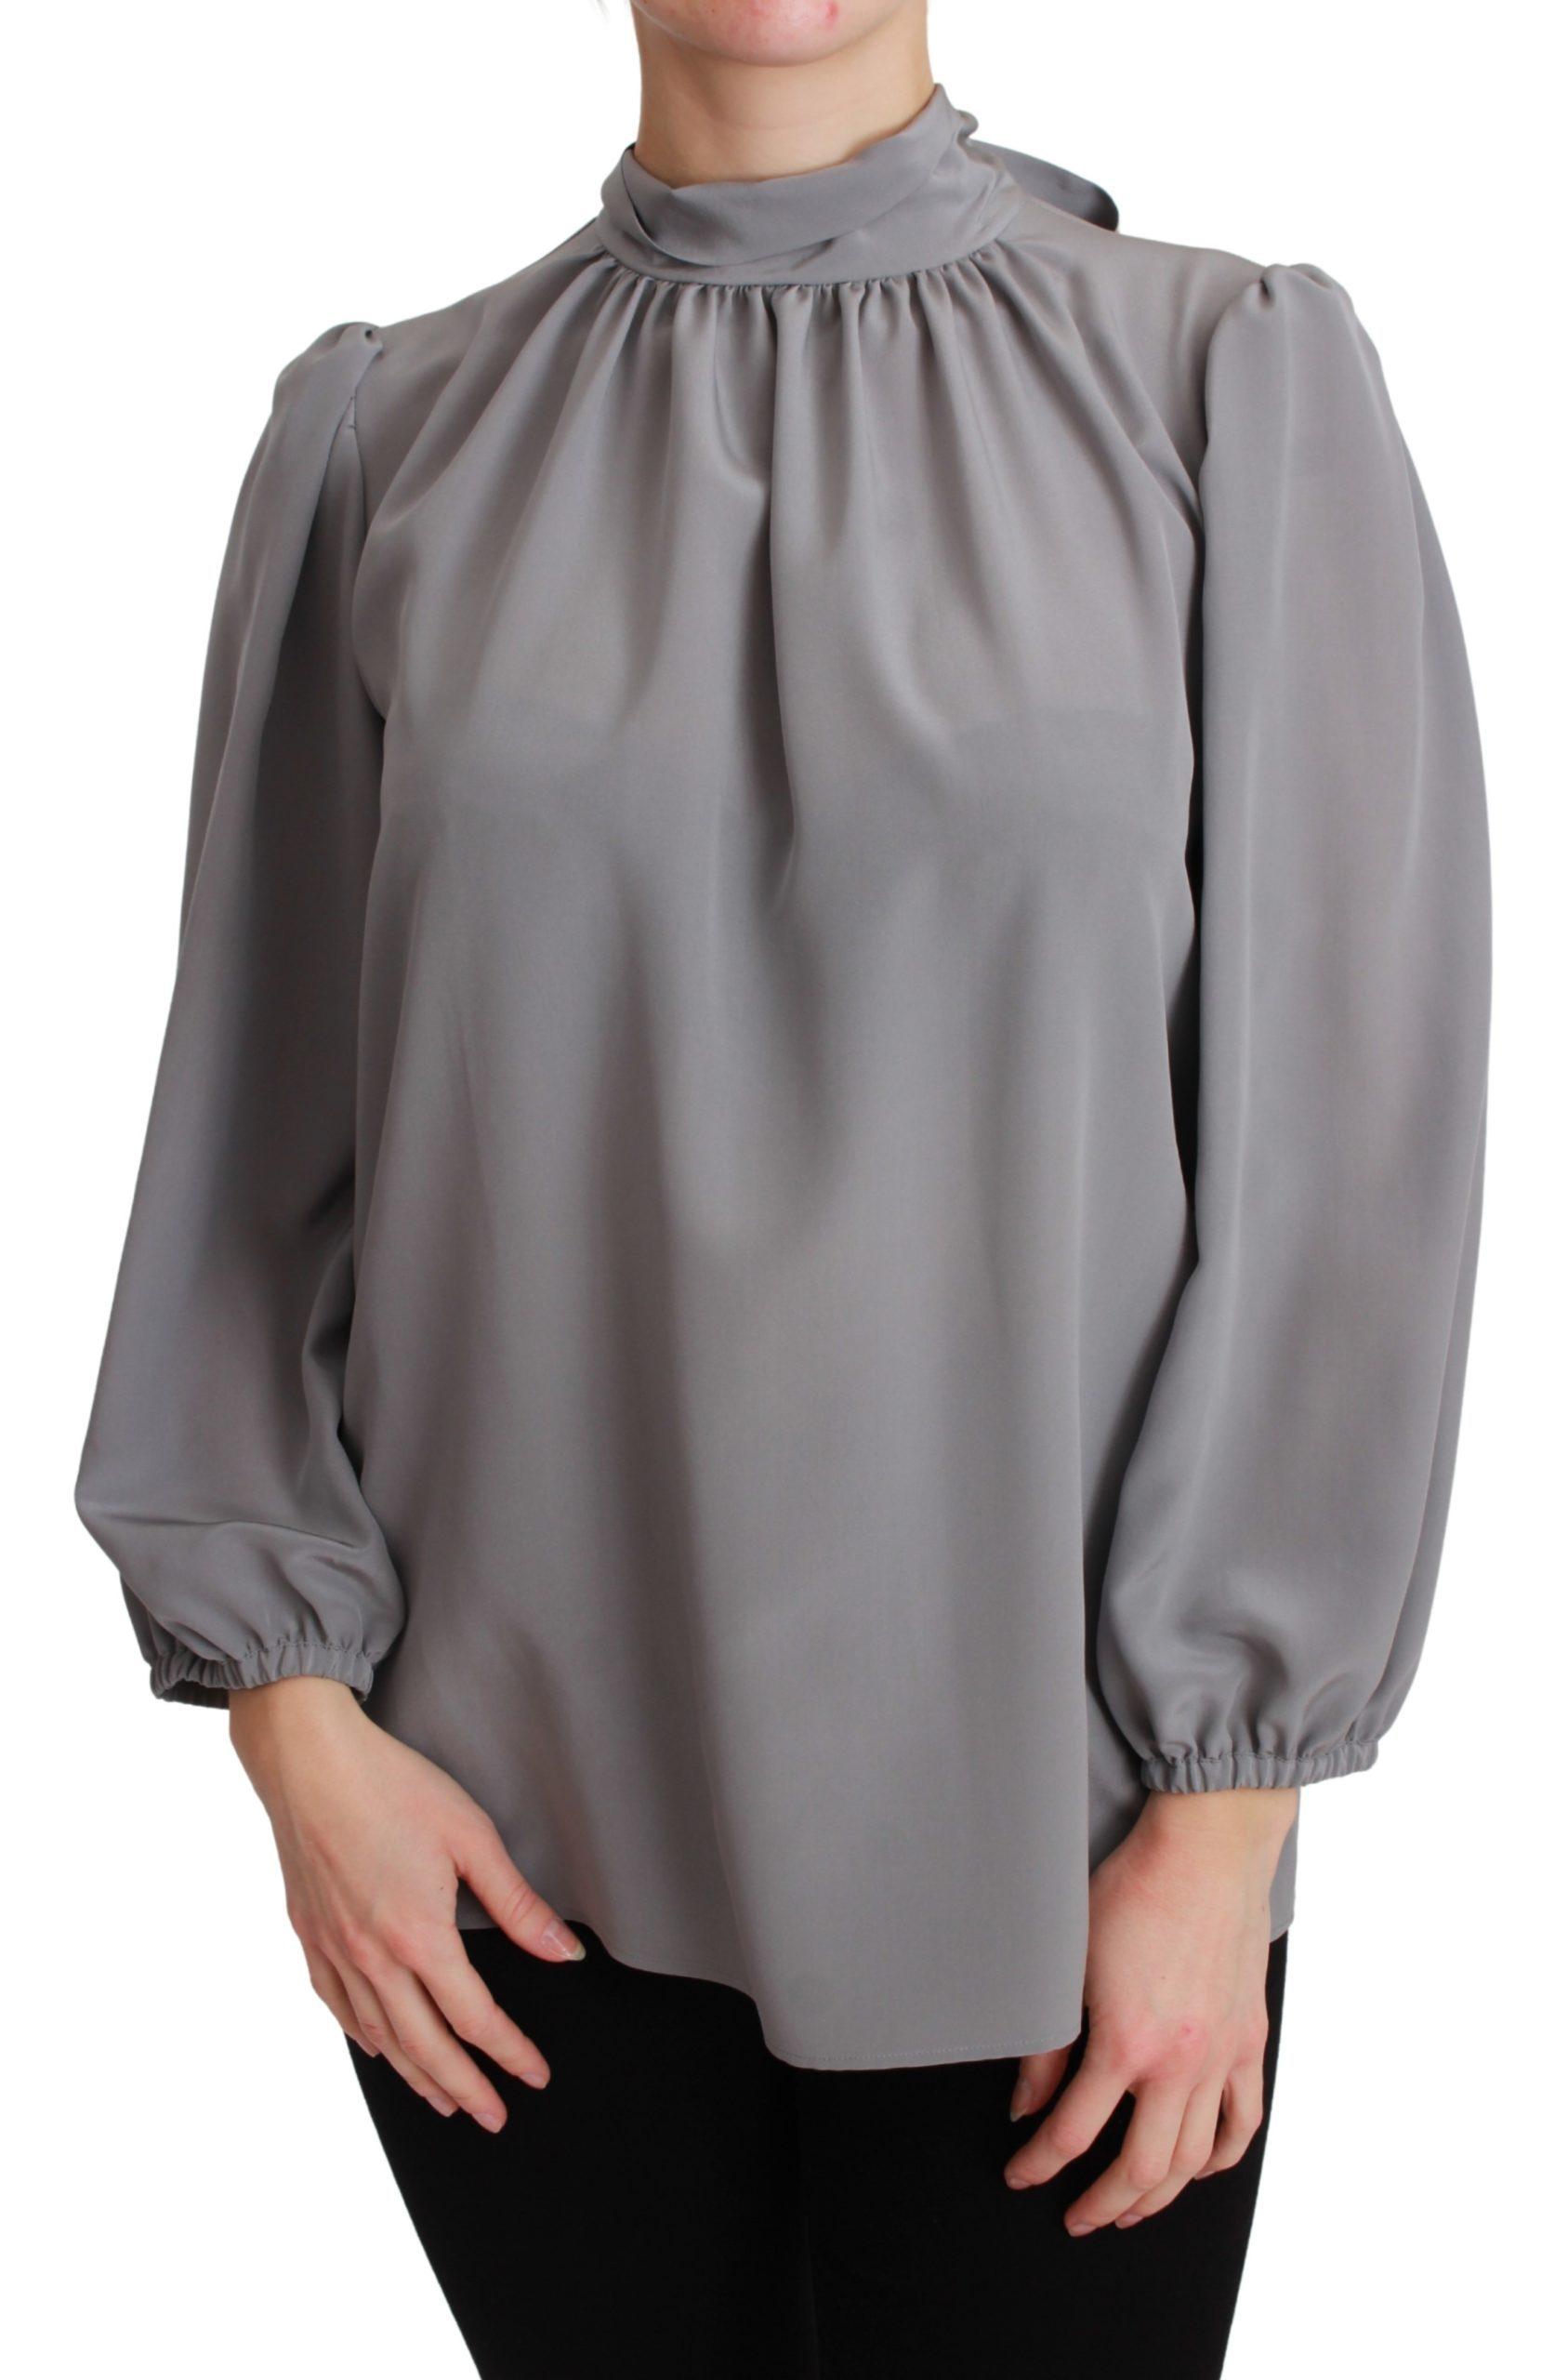 Dolce & Gabbana Women's Silk Neck Bow Shirt Gray TSH2675 - IT38|XS